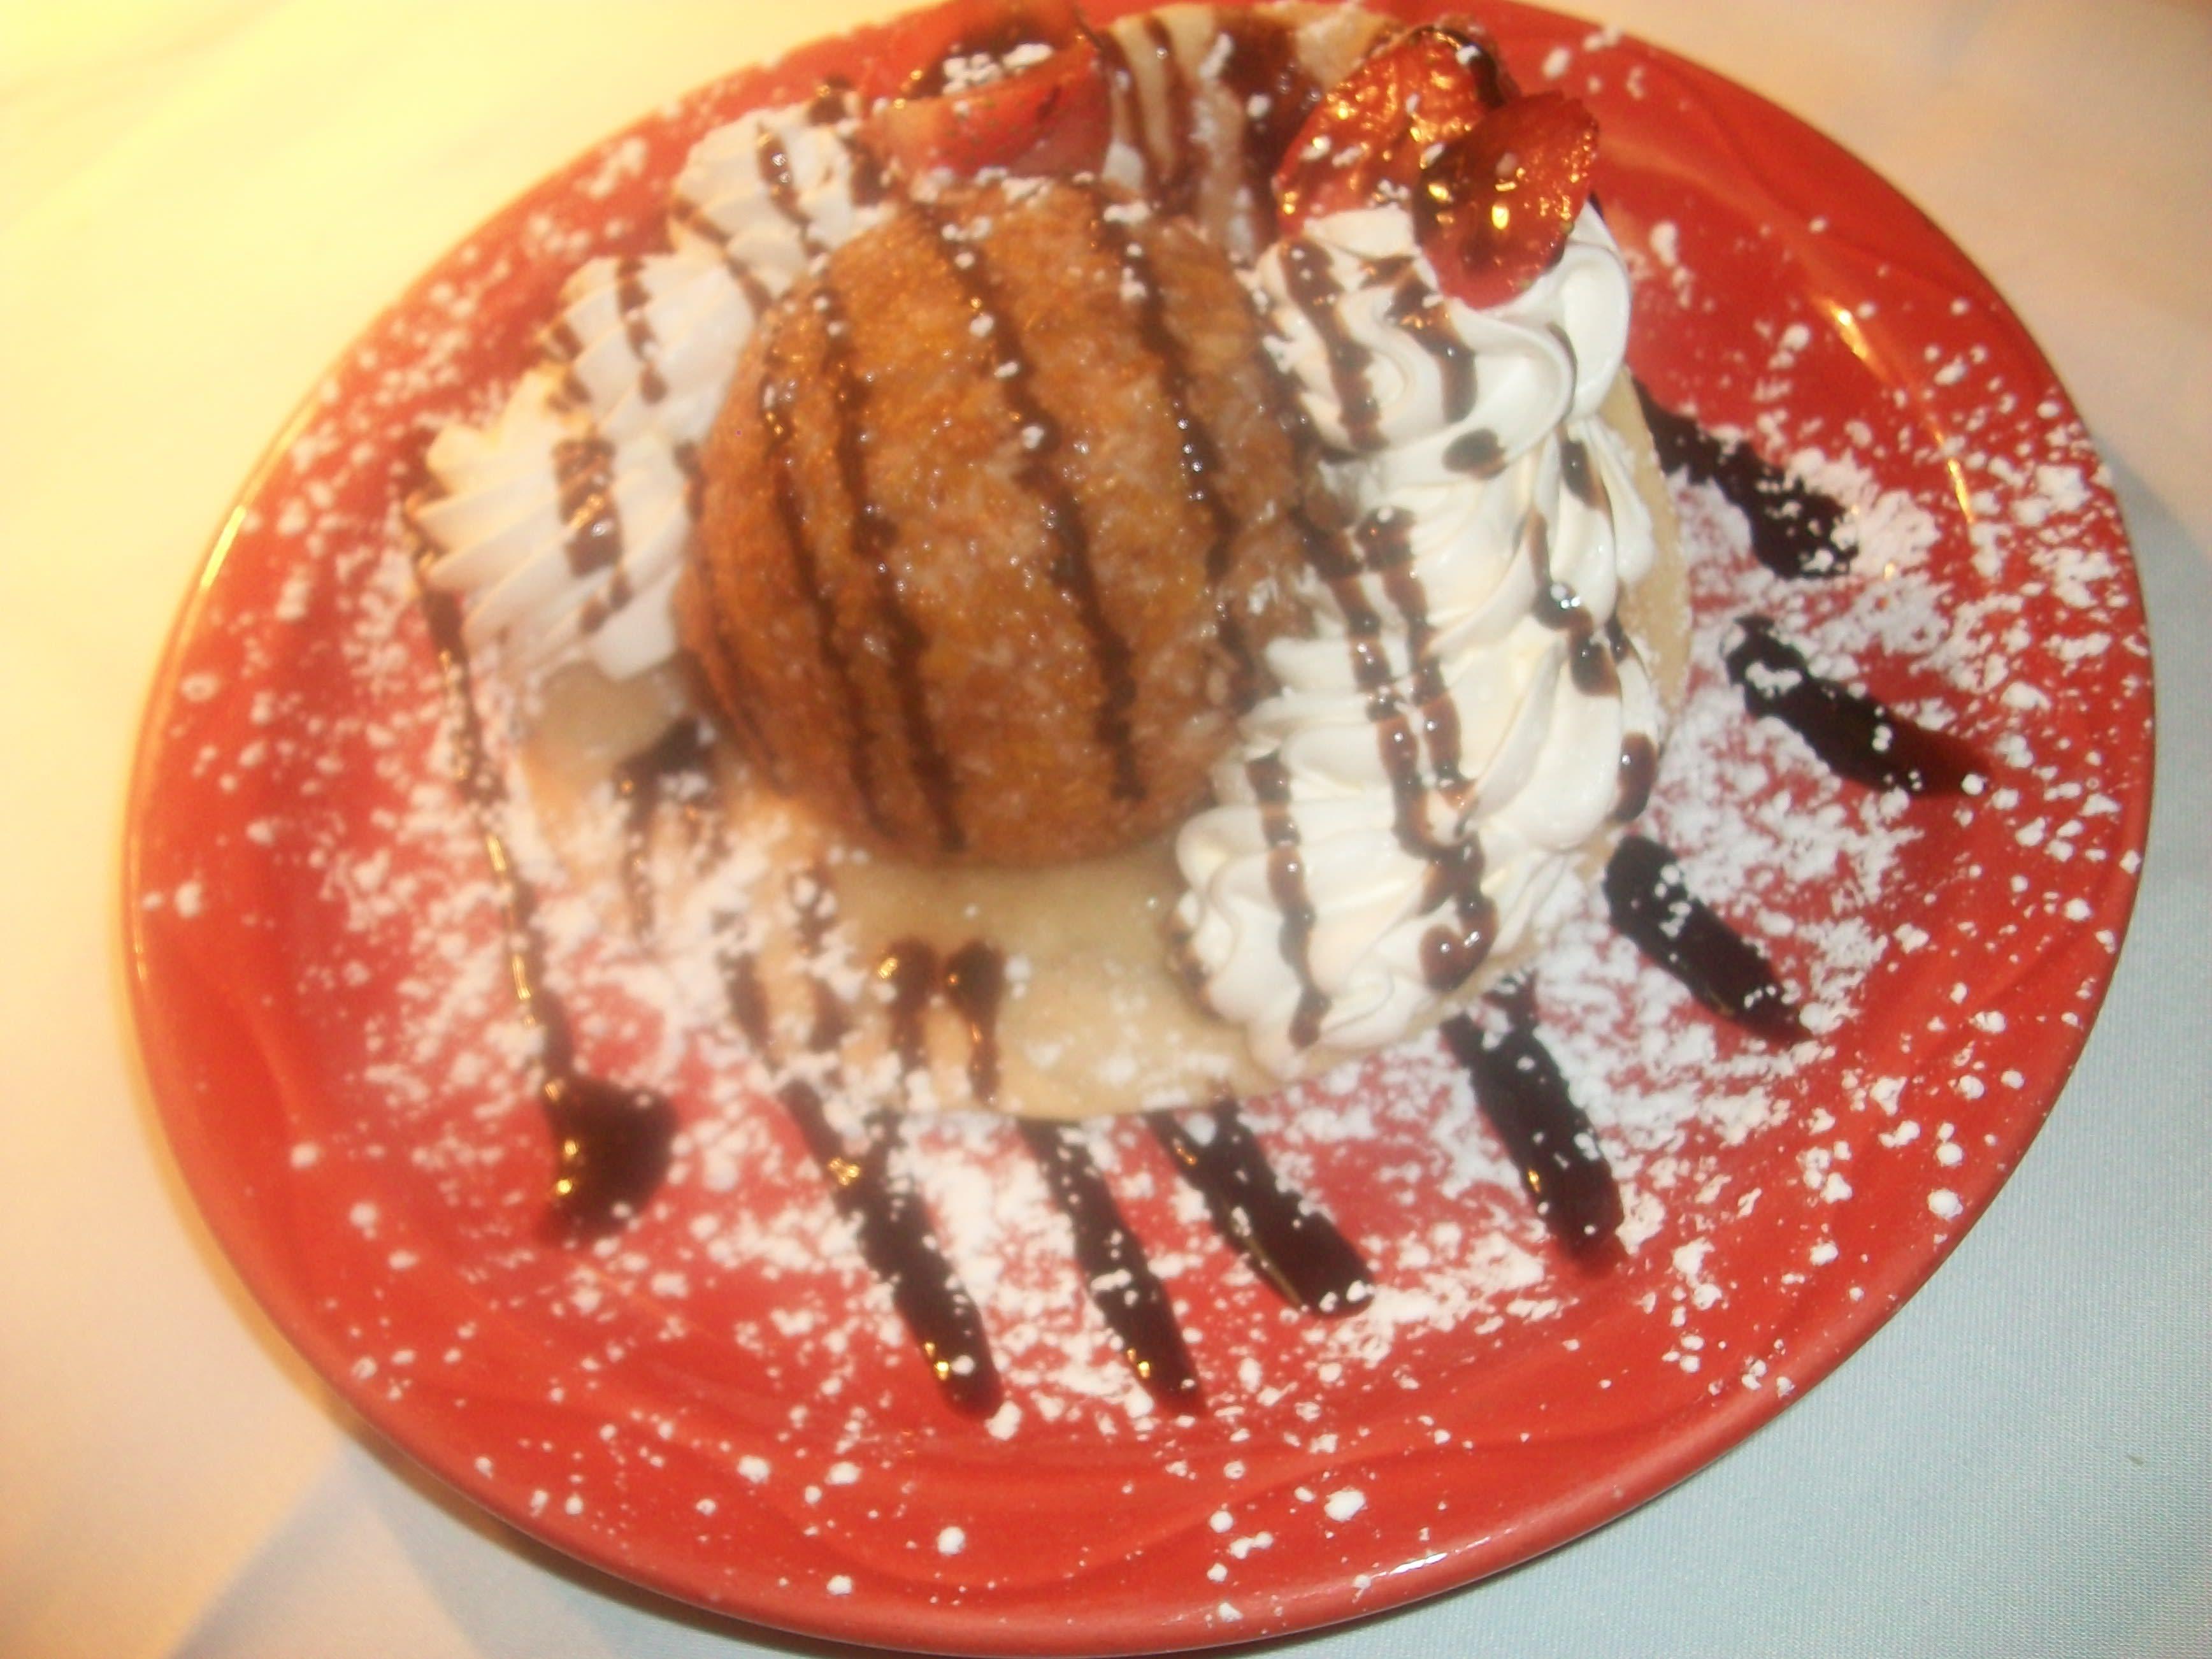 Fried Ice Cream at Margarita's